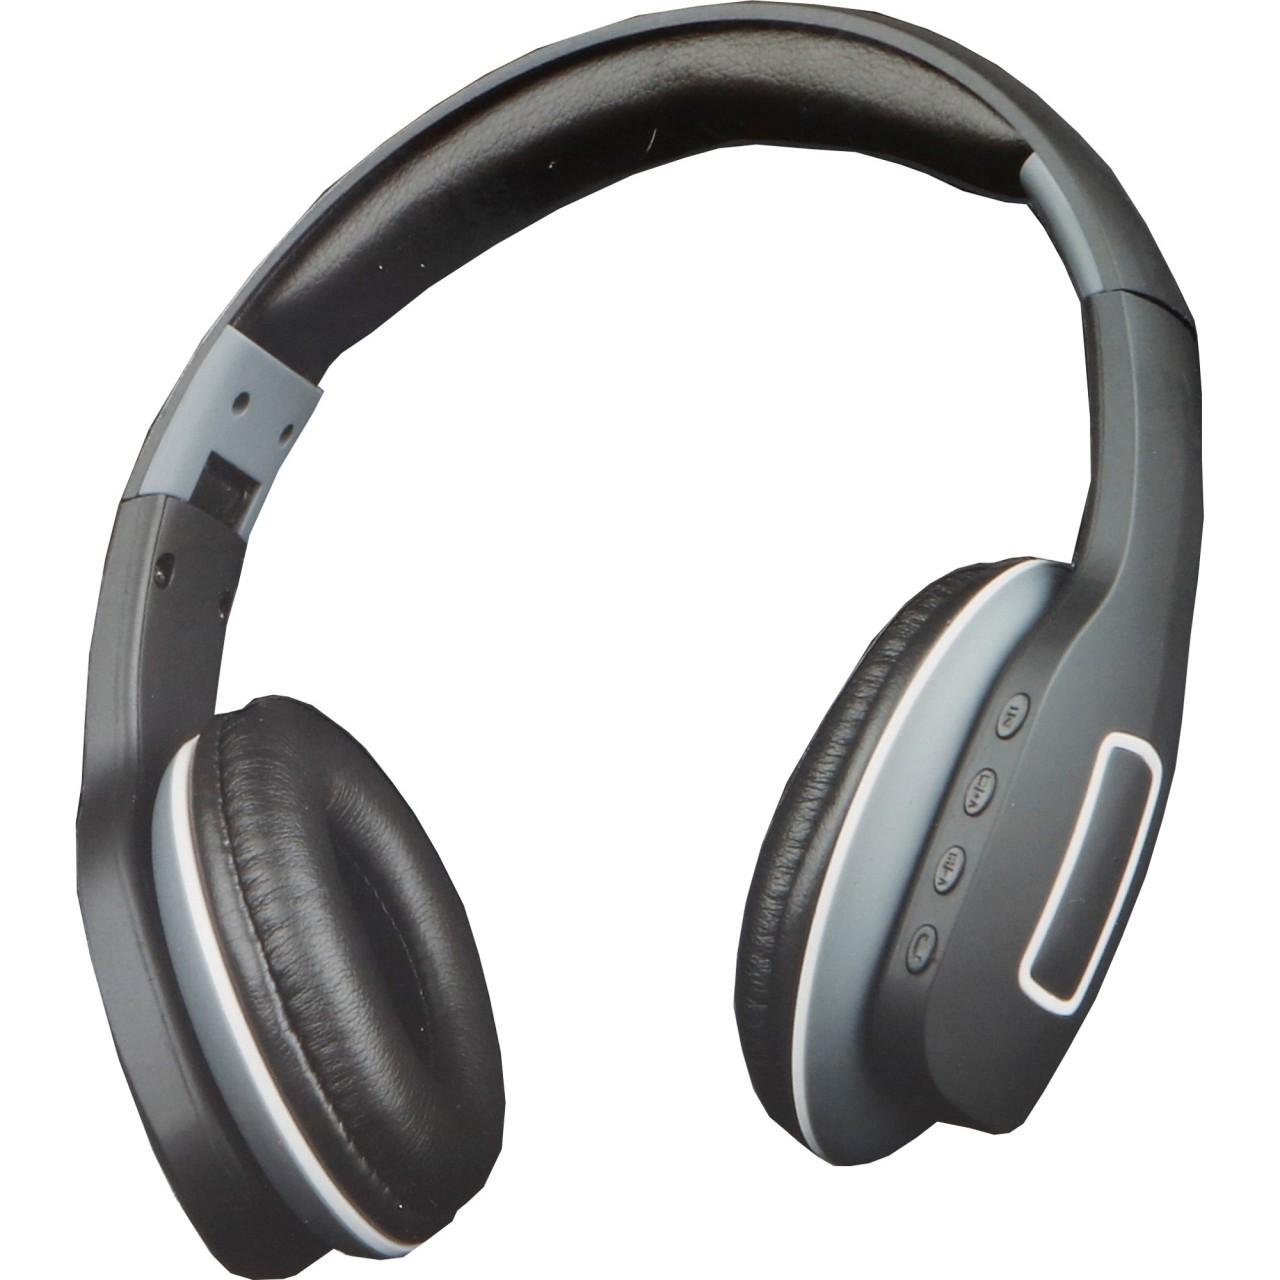 Kopfhörer Bluetooth SILVER EDITION - Grau